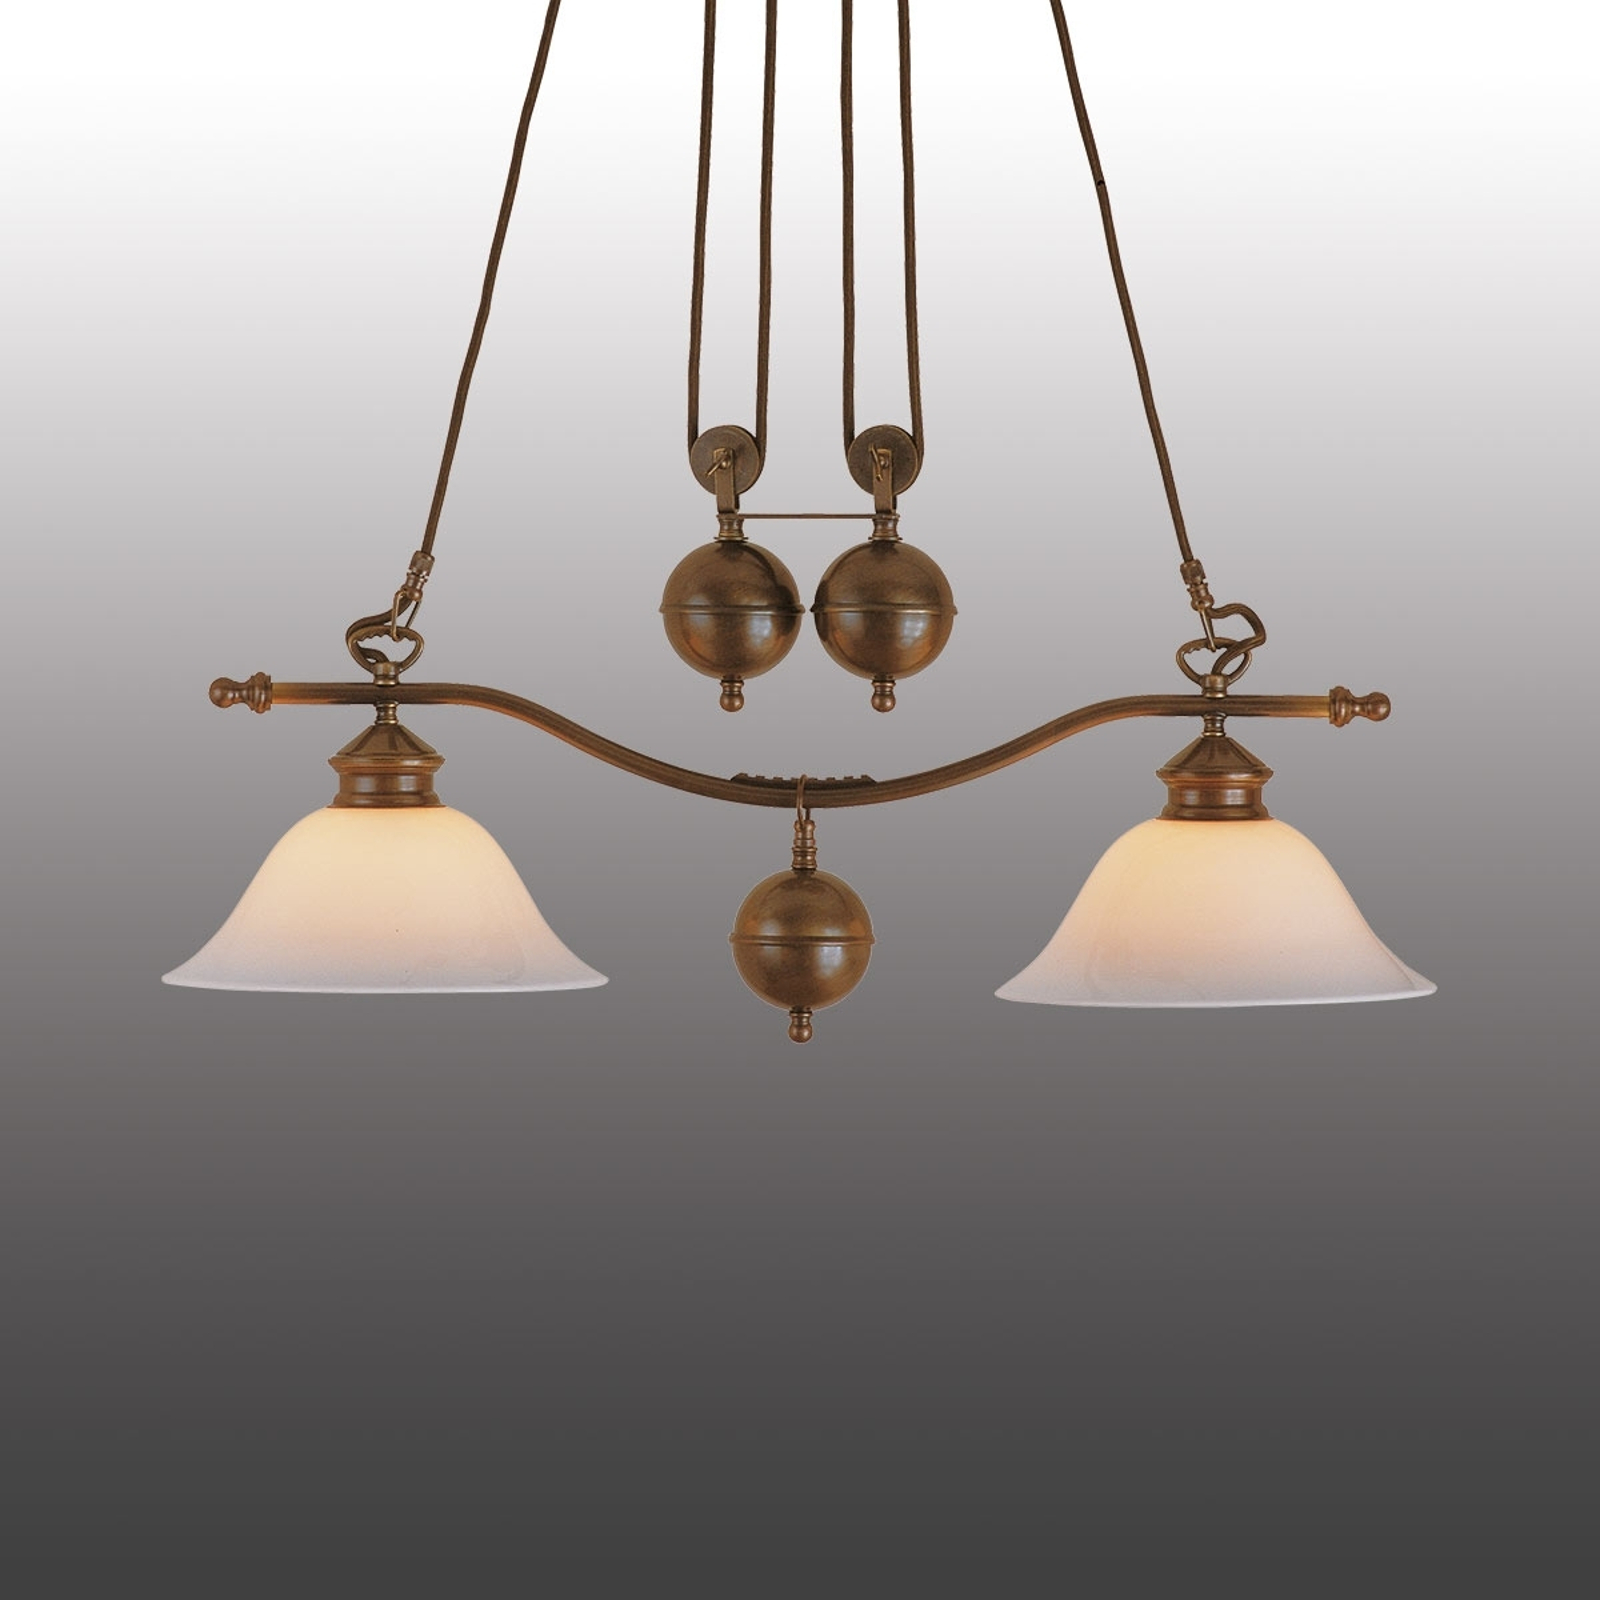 Pendellampe Anno 1900, to lys